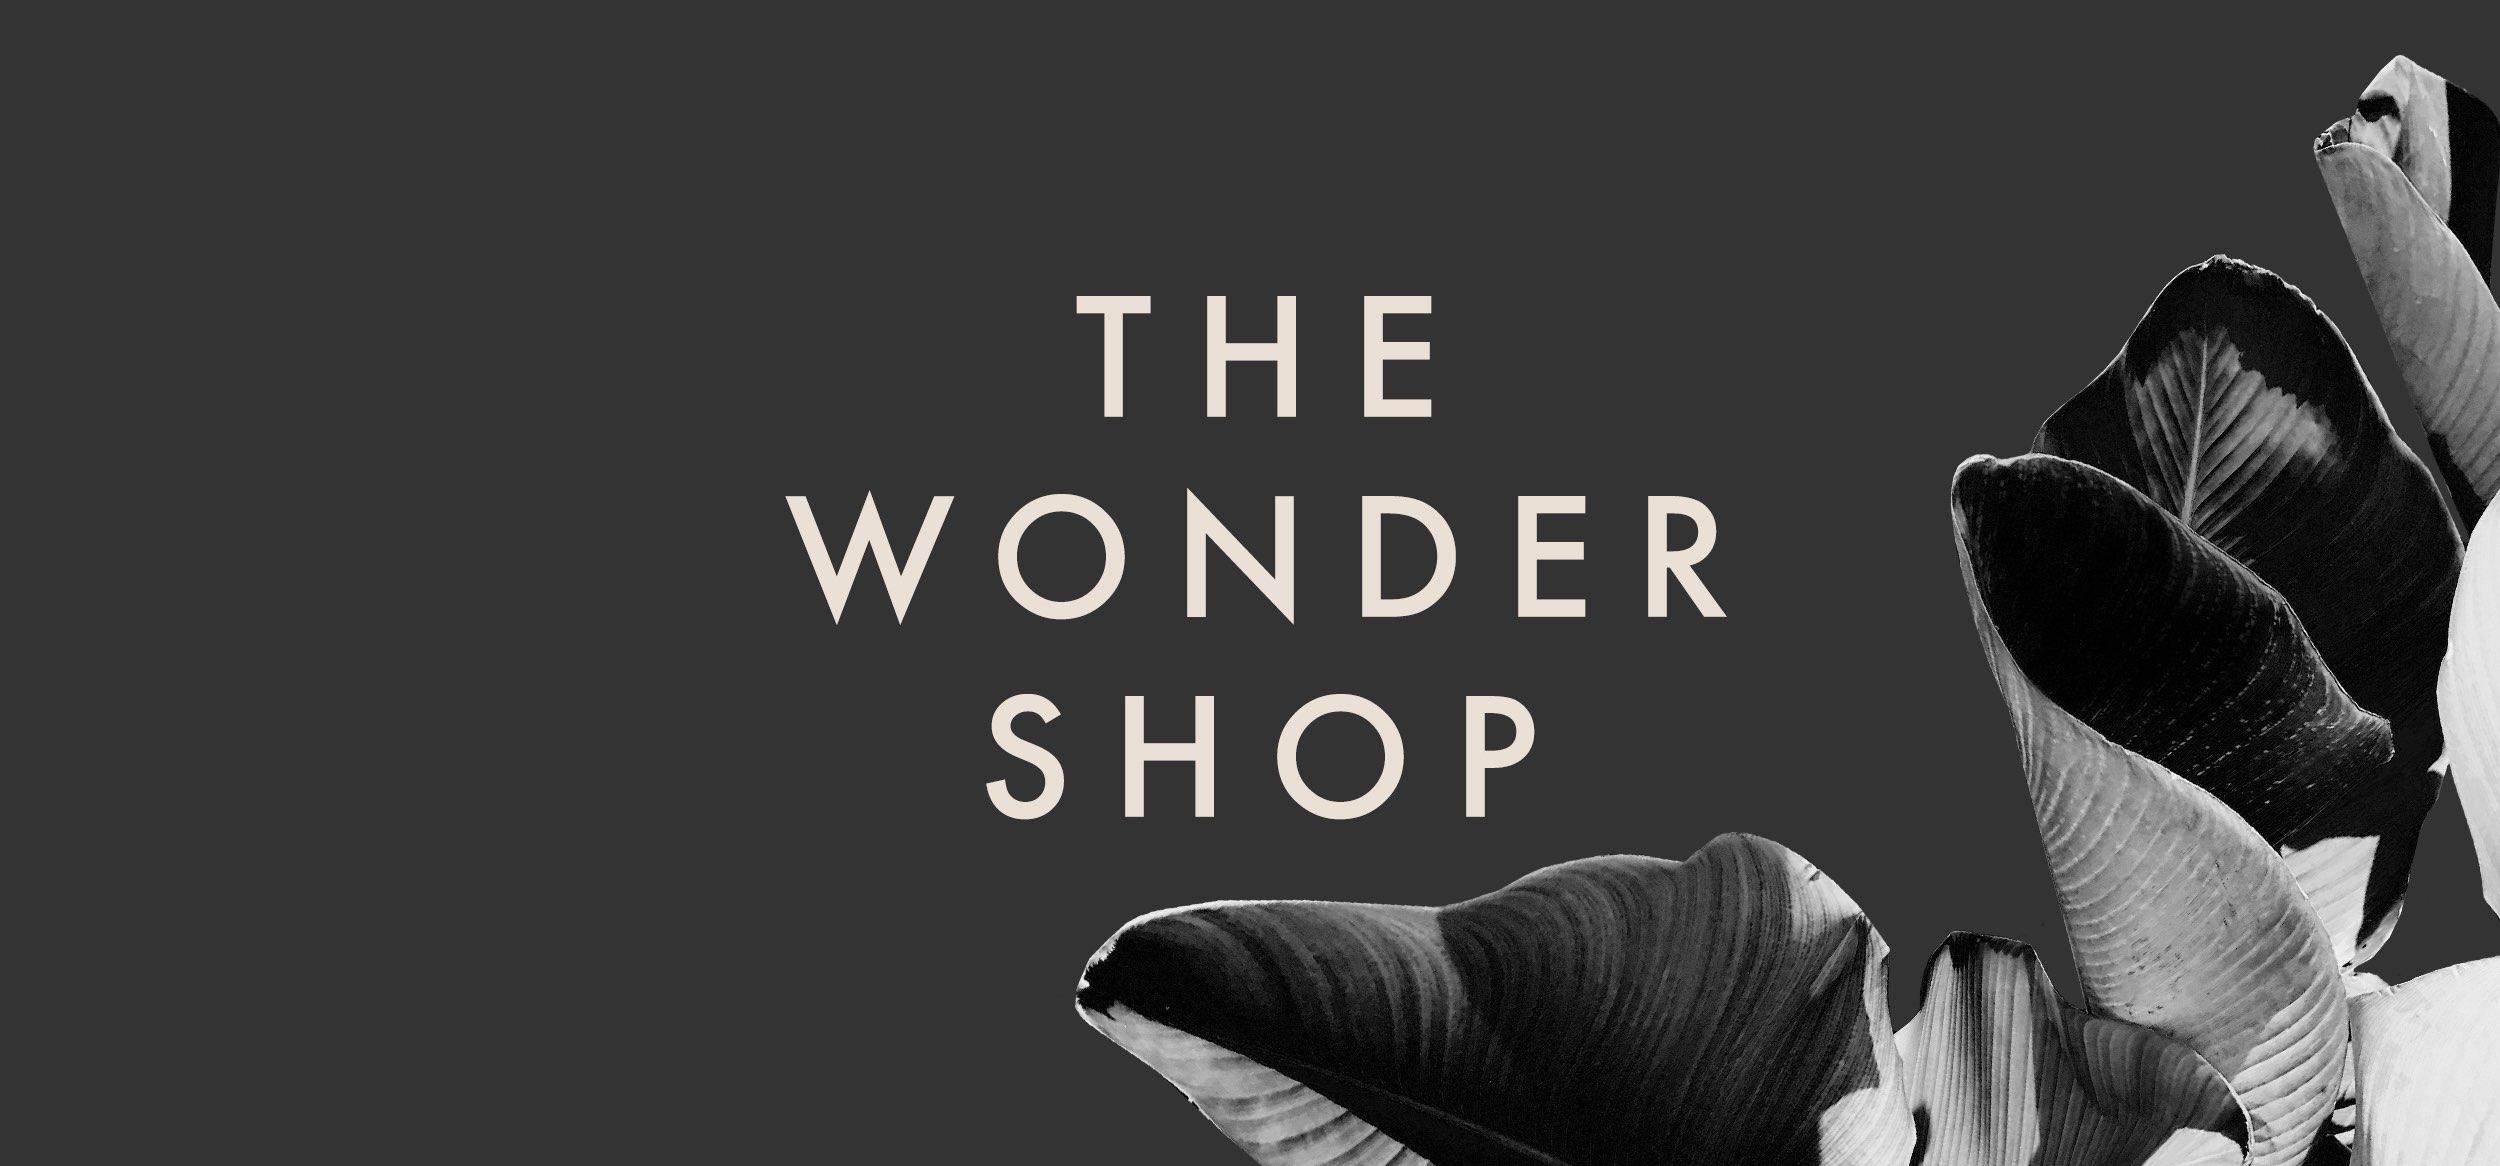 The Wonder Shop